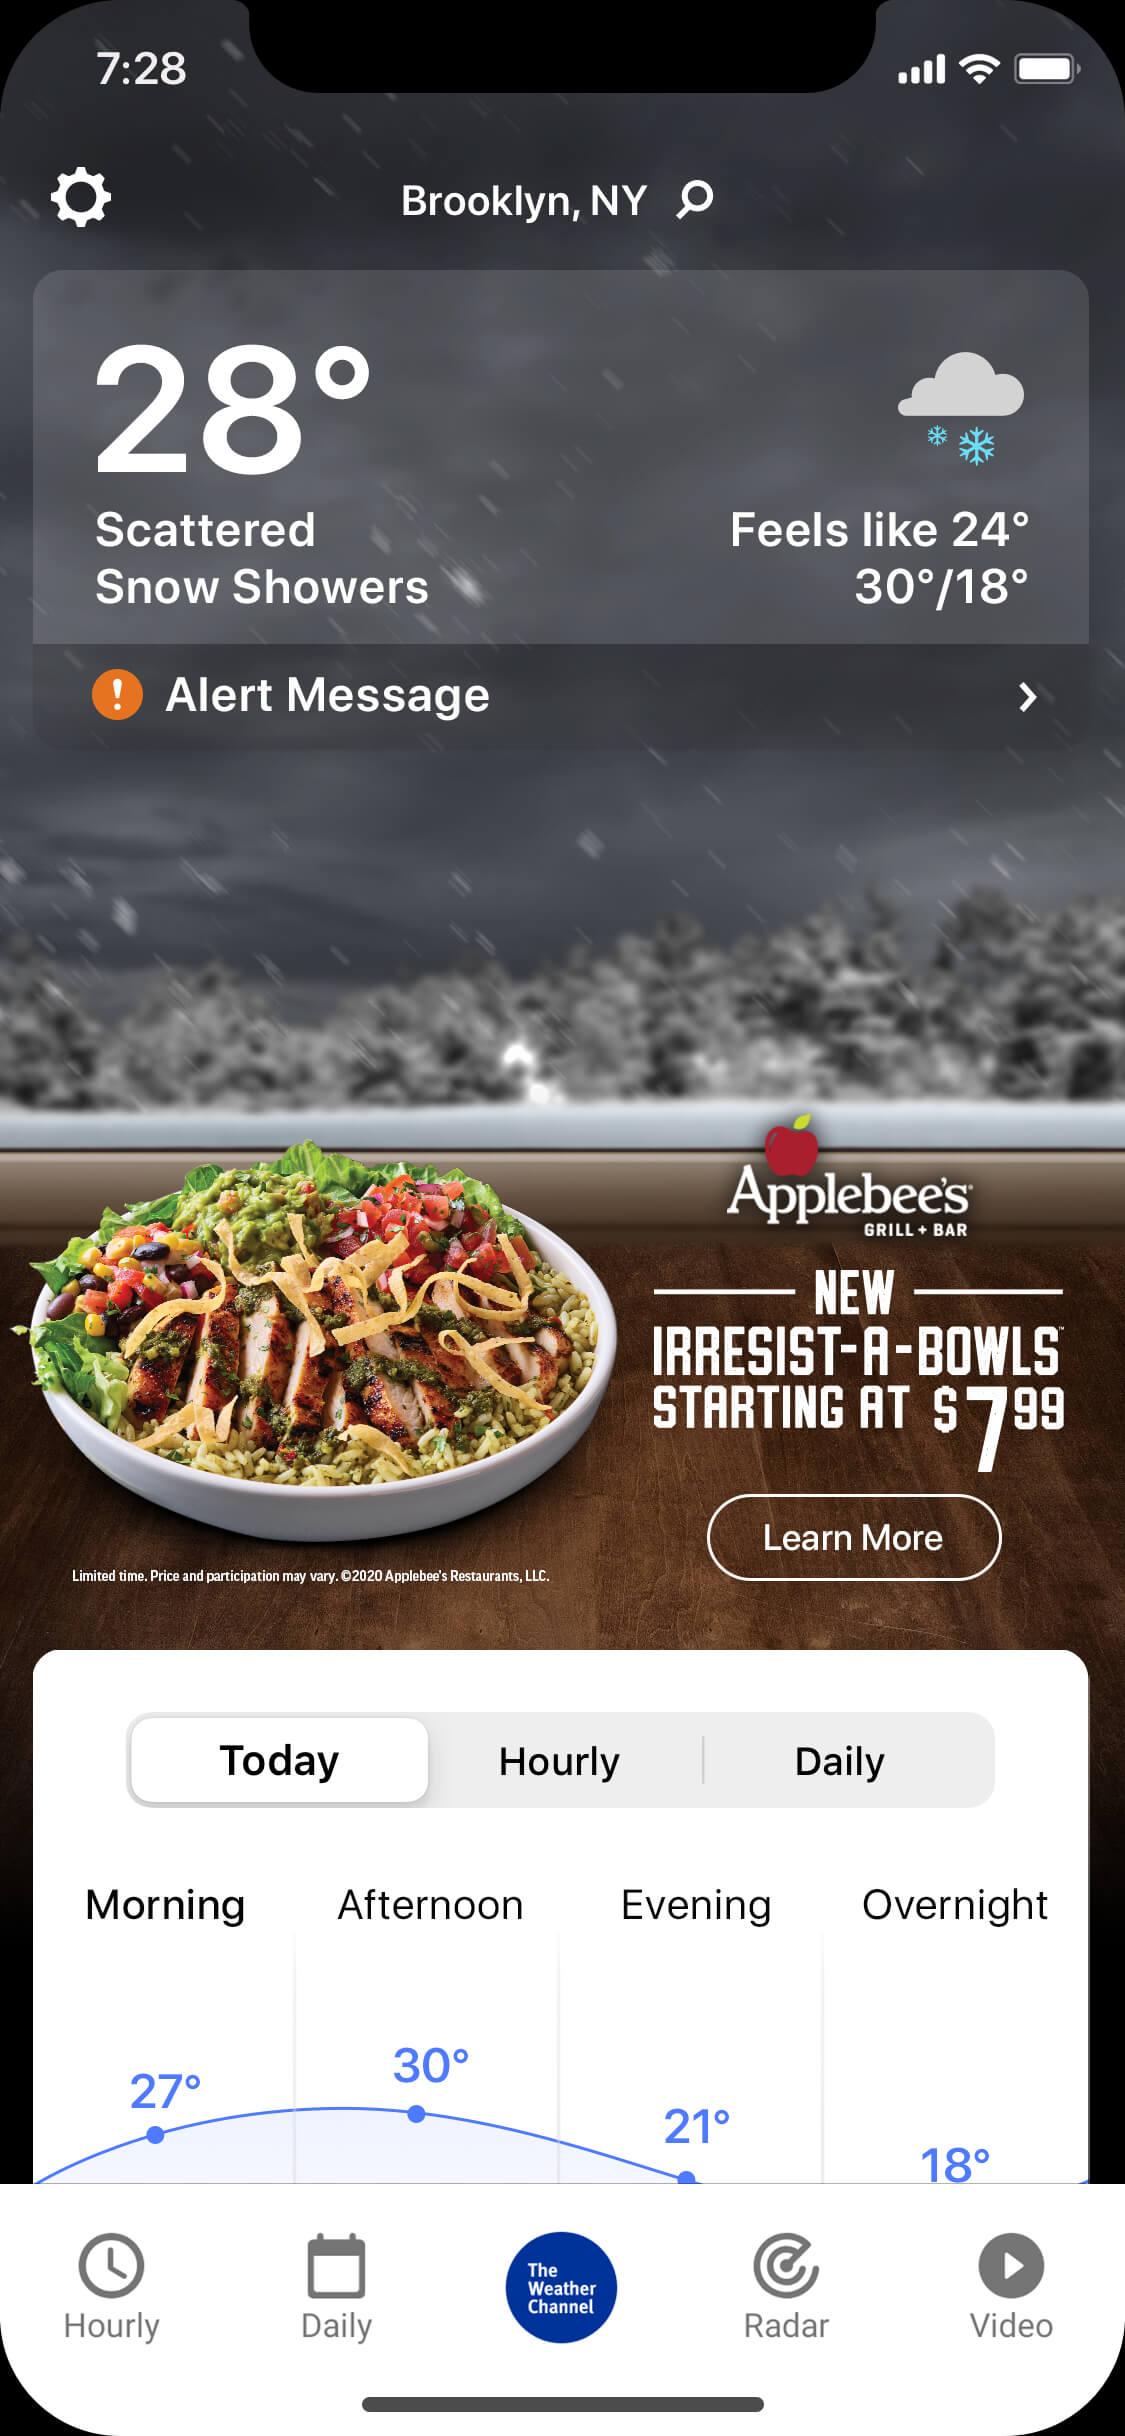 applebees-bowls-im_wintry-day